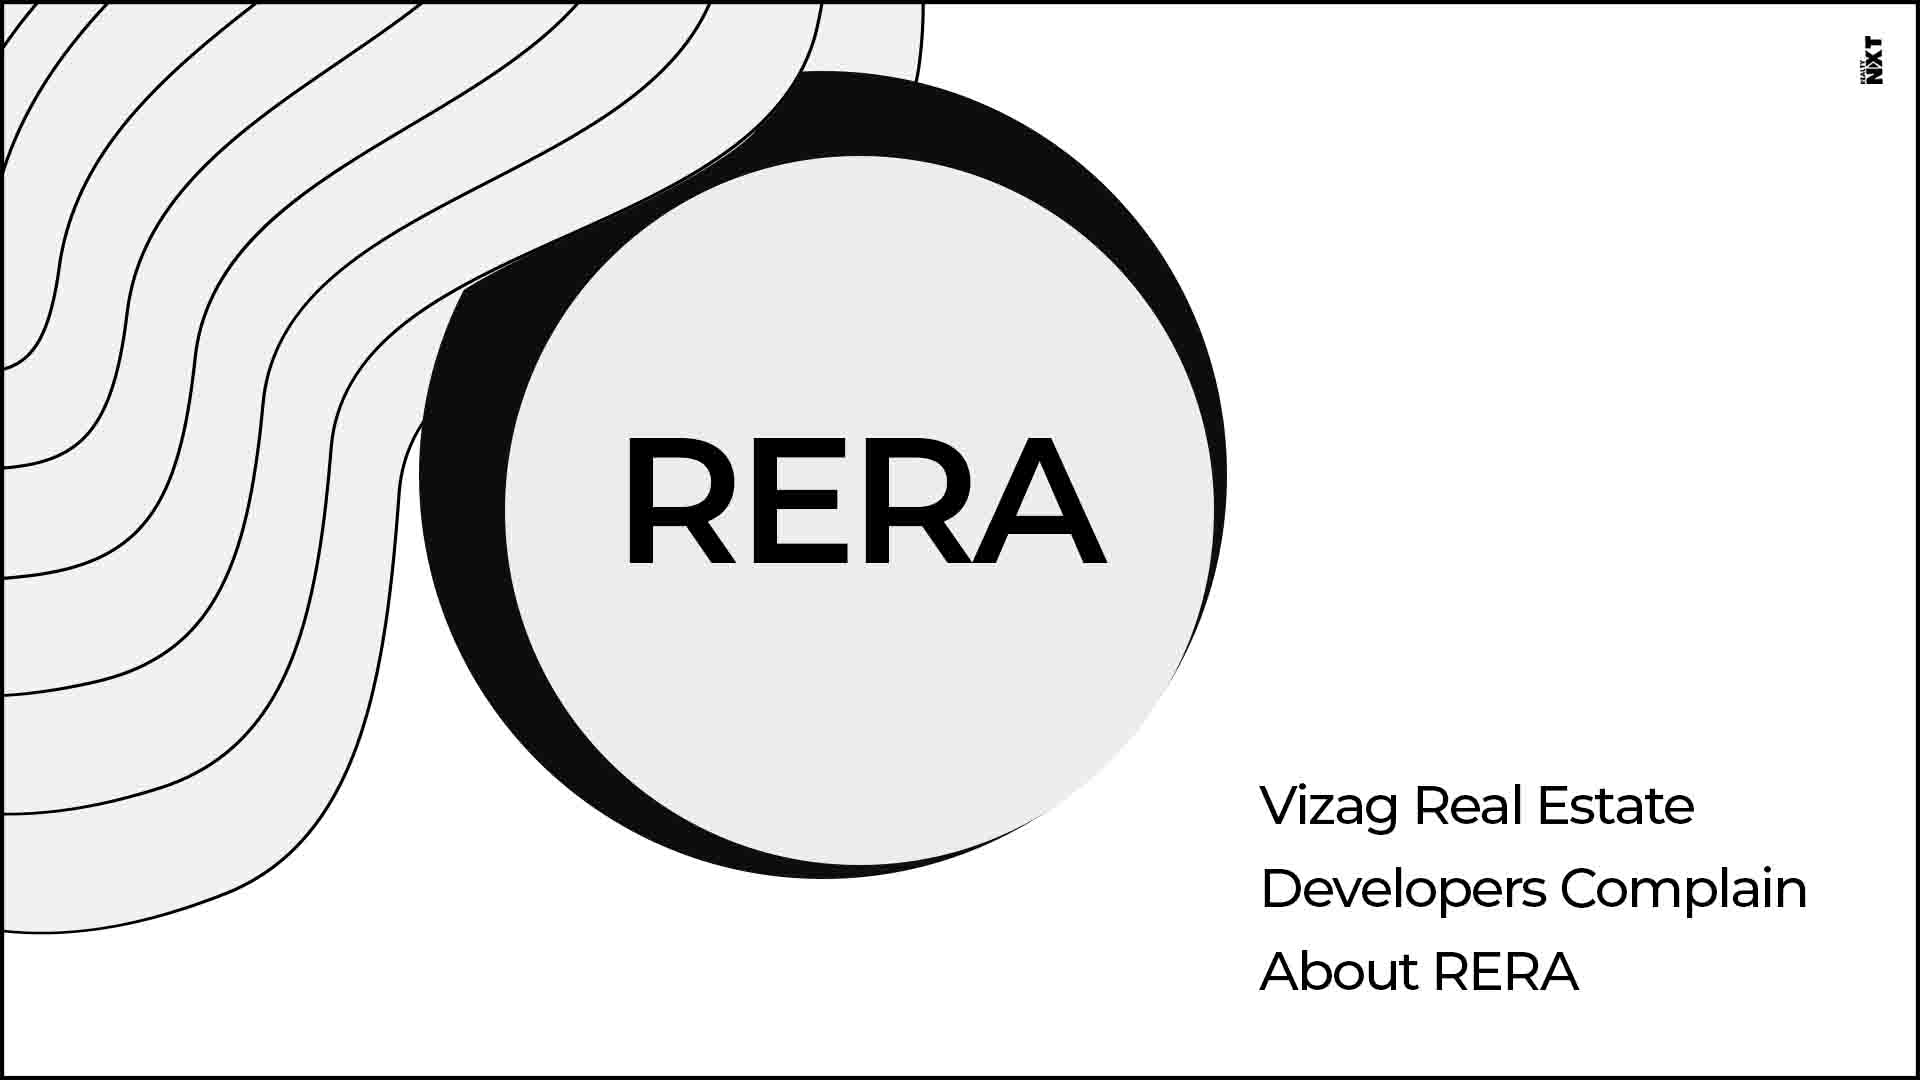 Vizag Developers Unhappy With Complex RERA Process